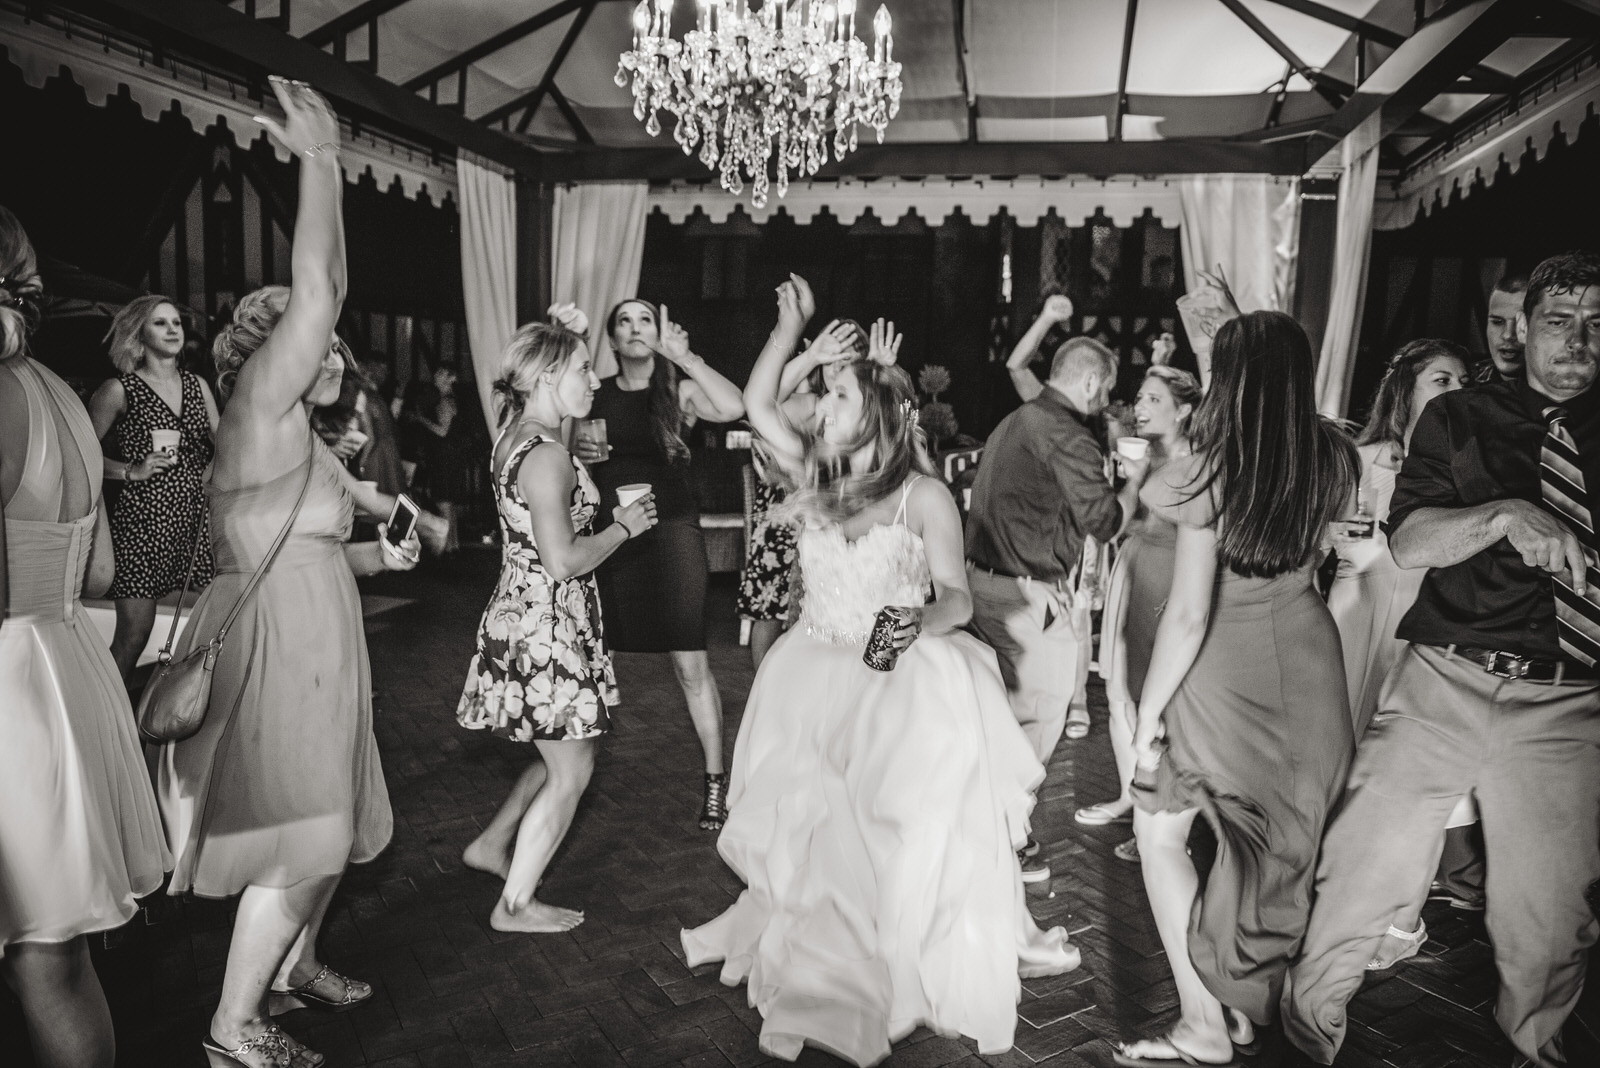 dancing at zenner house wedding